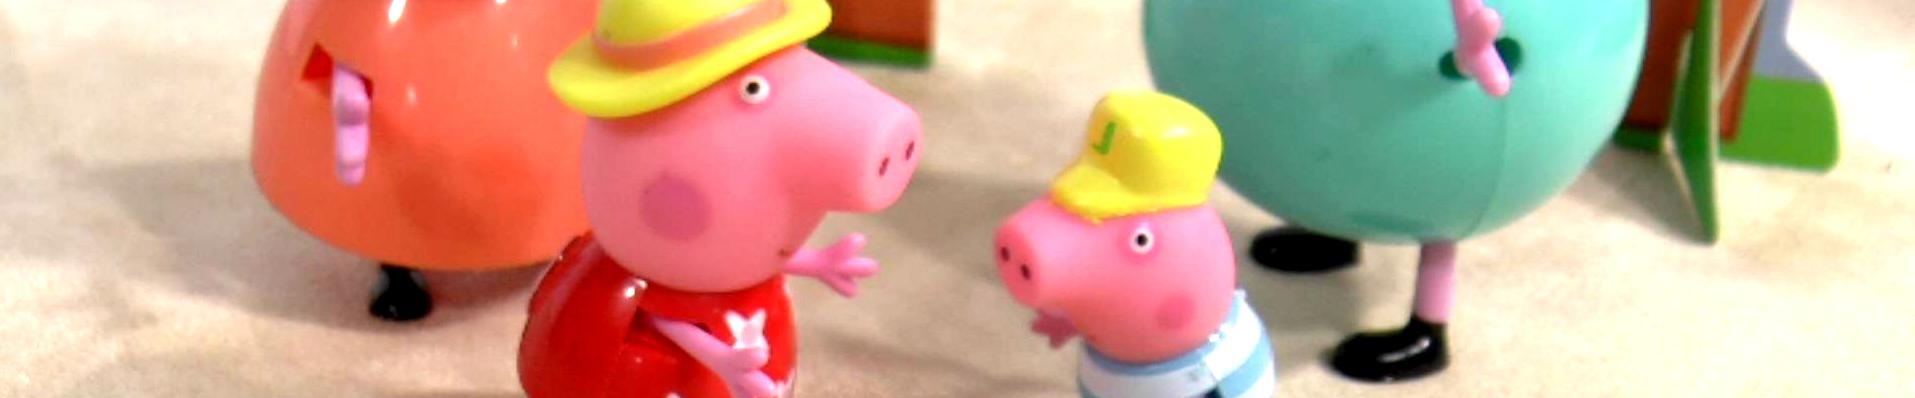 Peppa Pig Photo